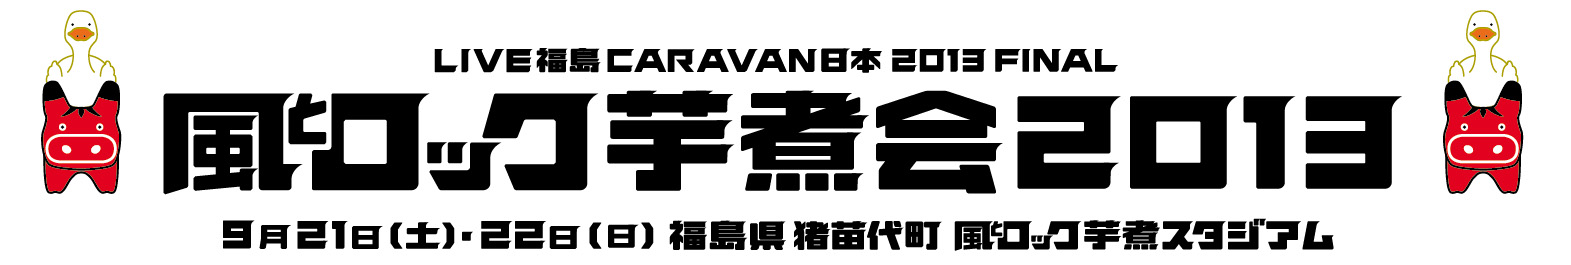 0908_imoni2013_logo2.jpg